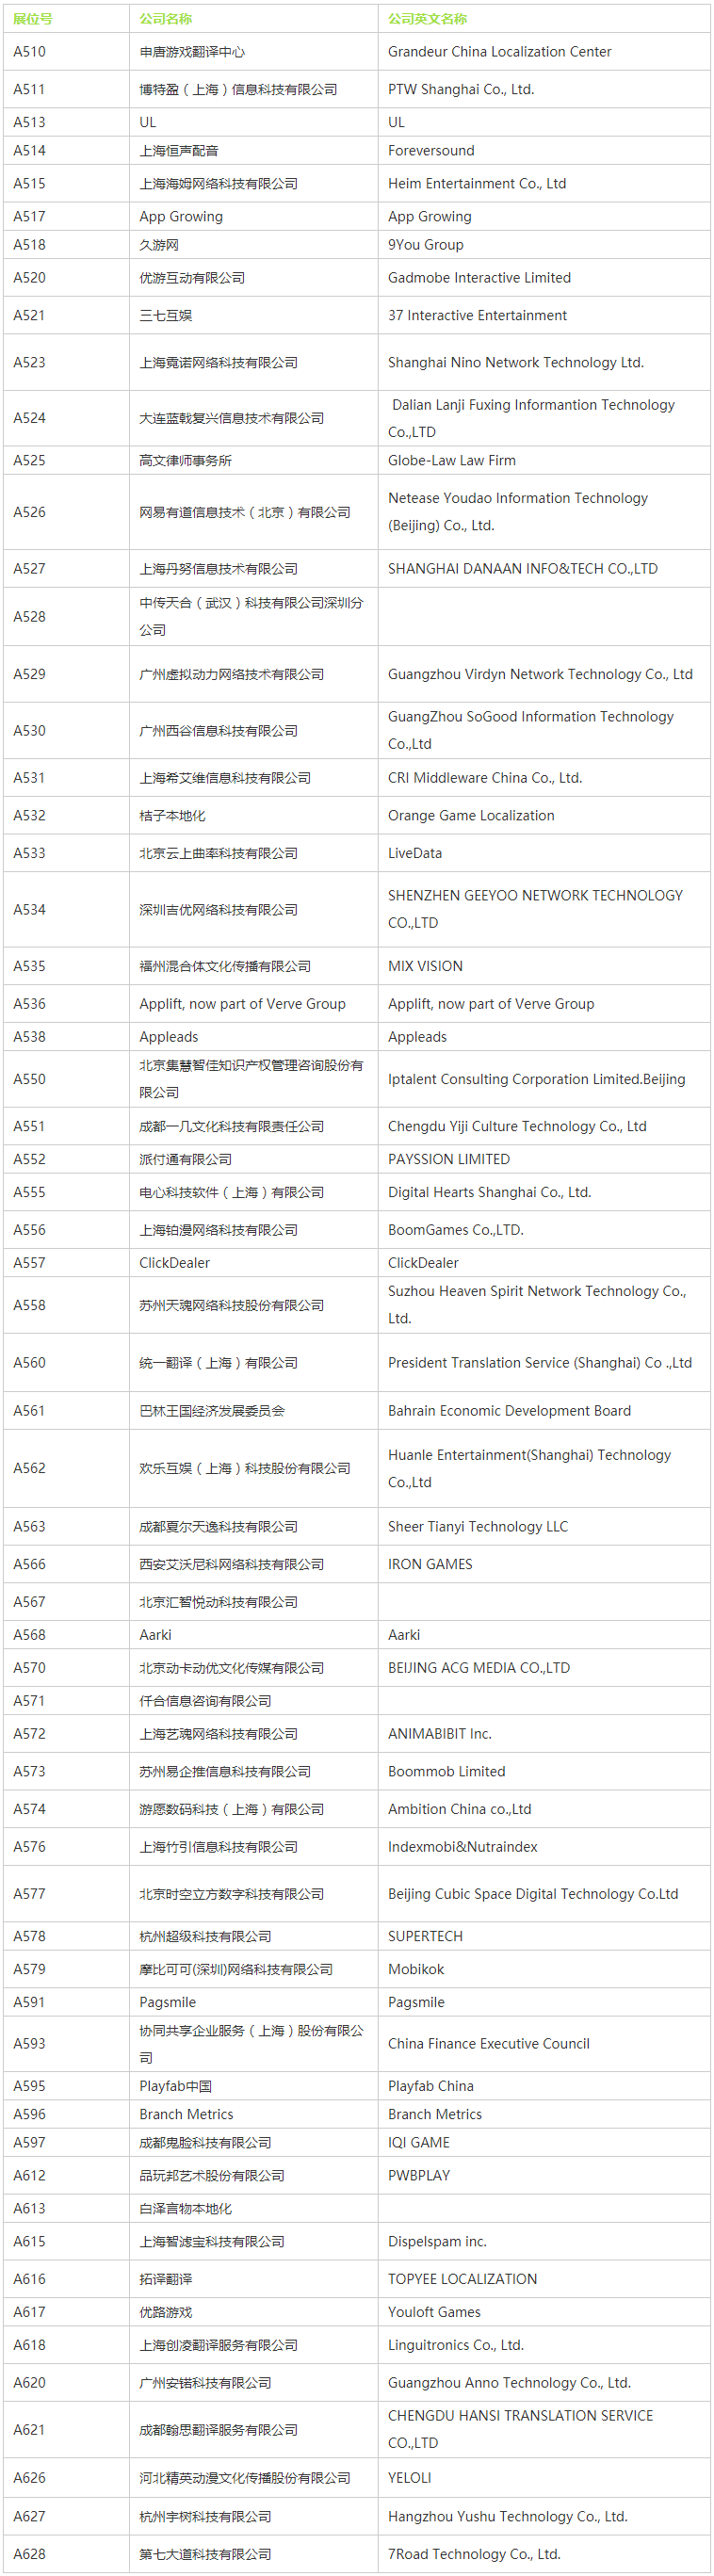 2020 ChinaJoy BTOB展商名单正式公布